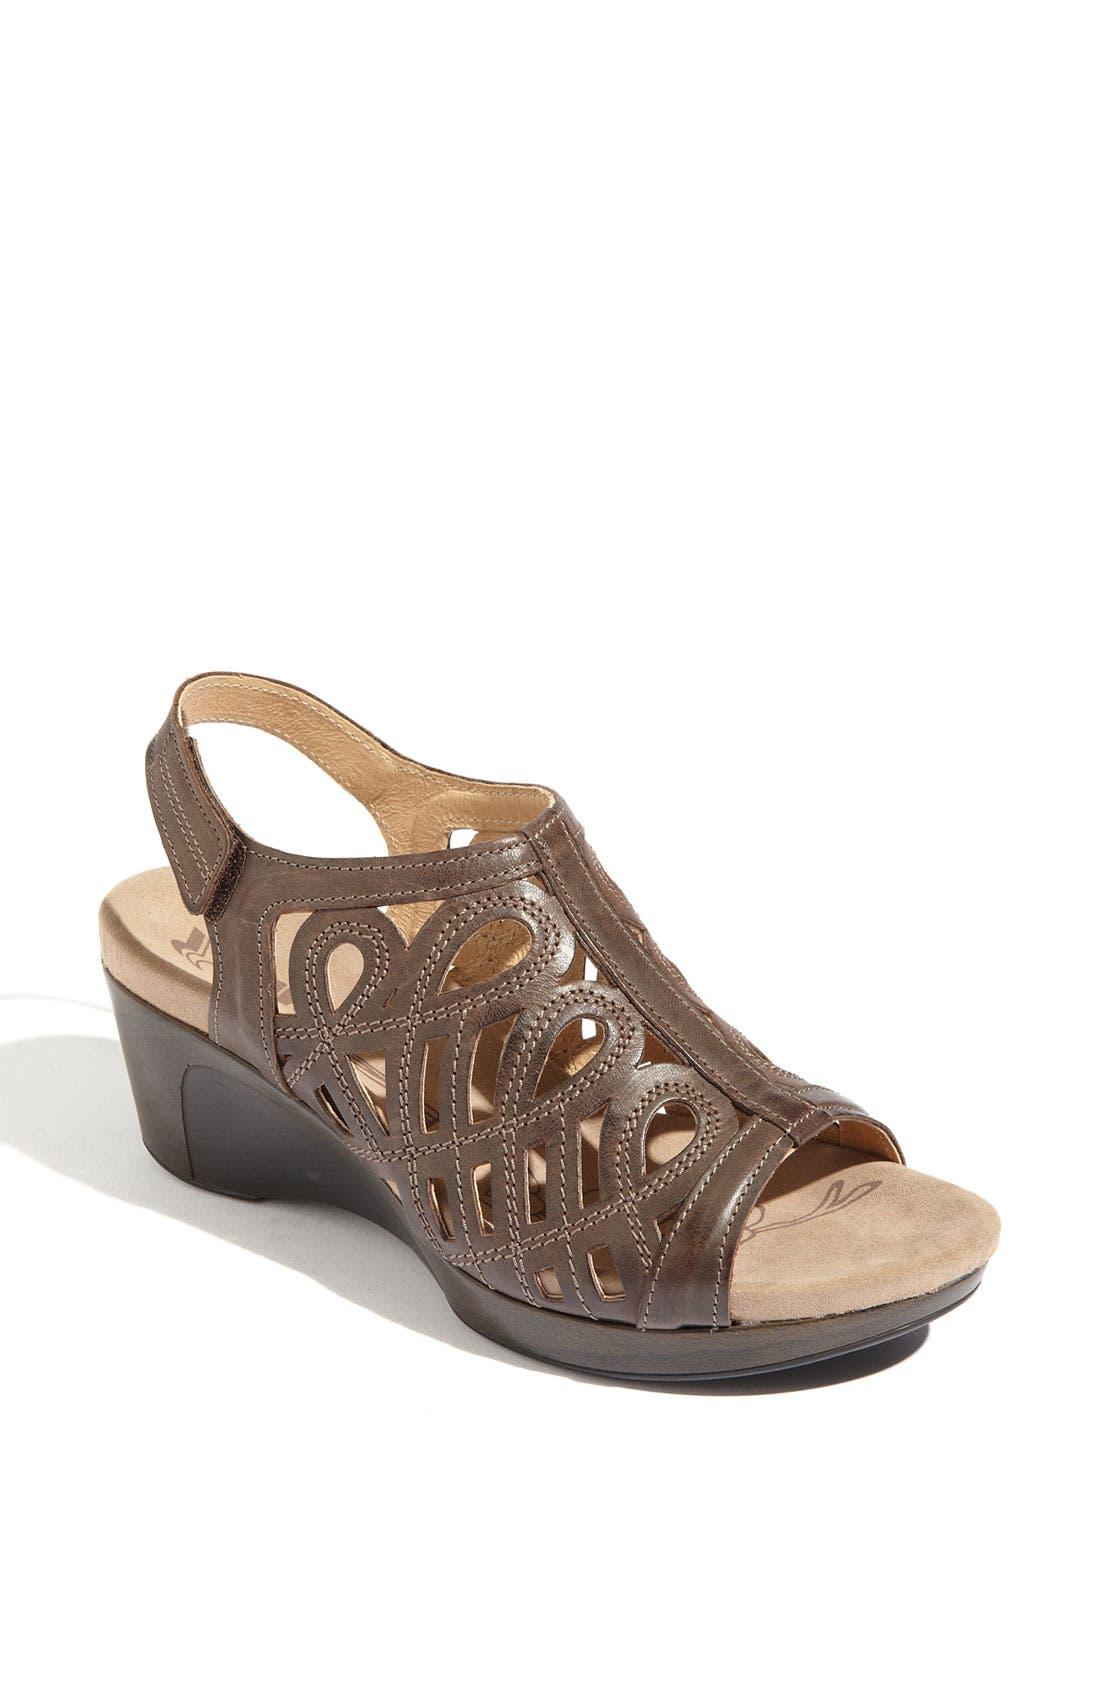 Main Image - Romika® 'Waikiki 19' Sandal